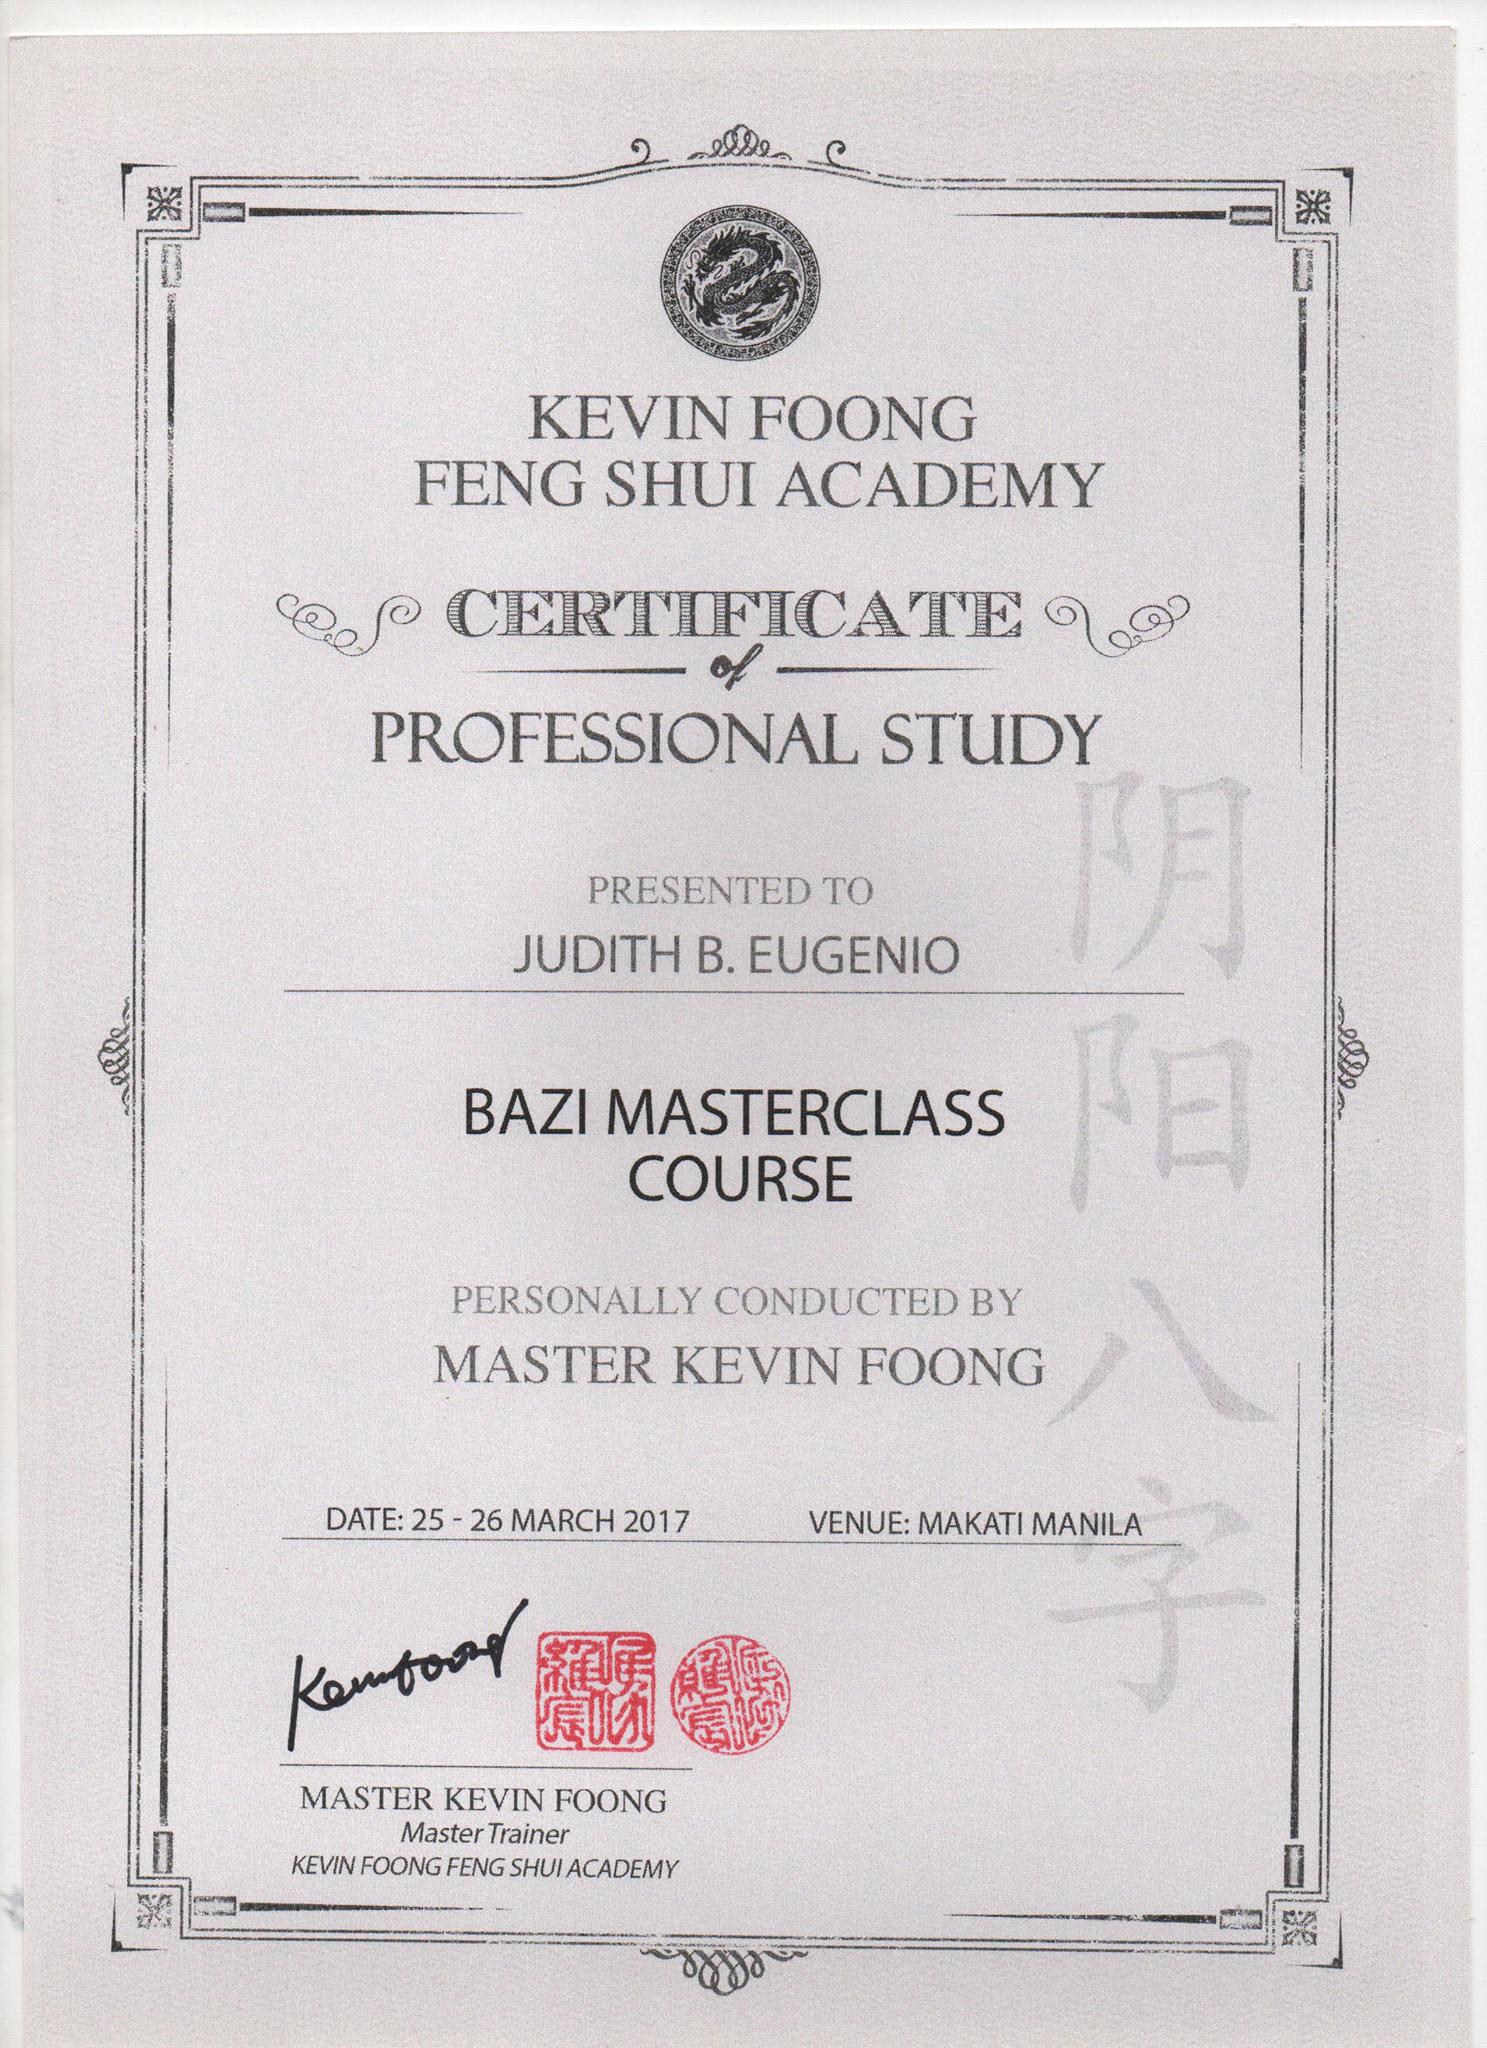 Bazi Masterclass Course